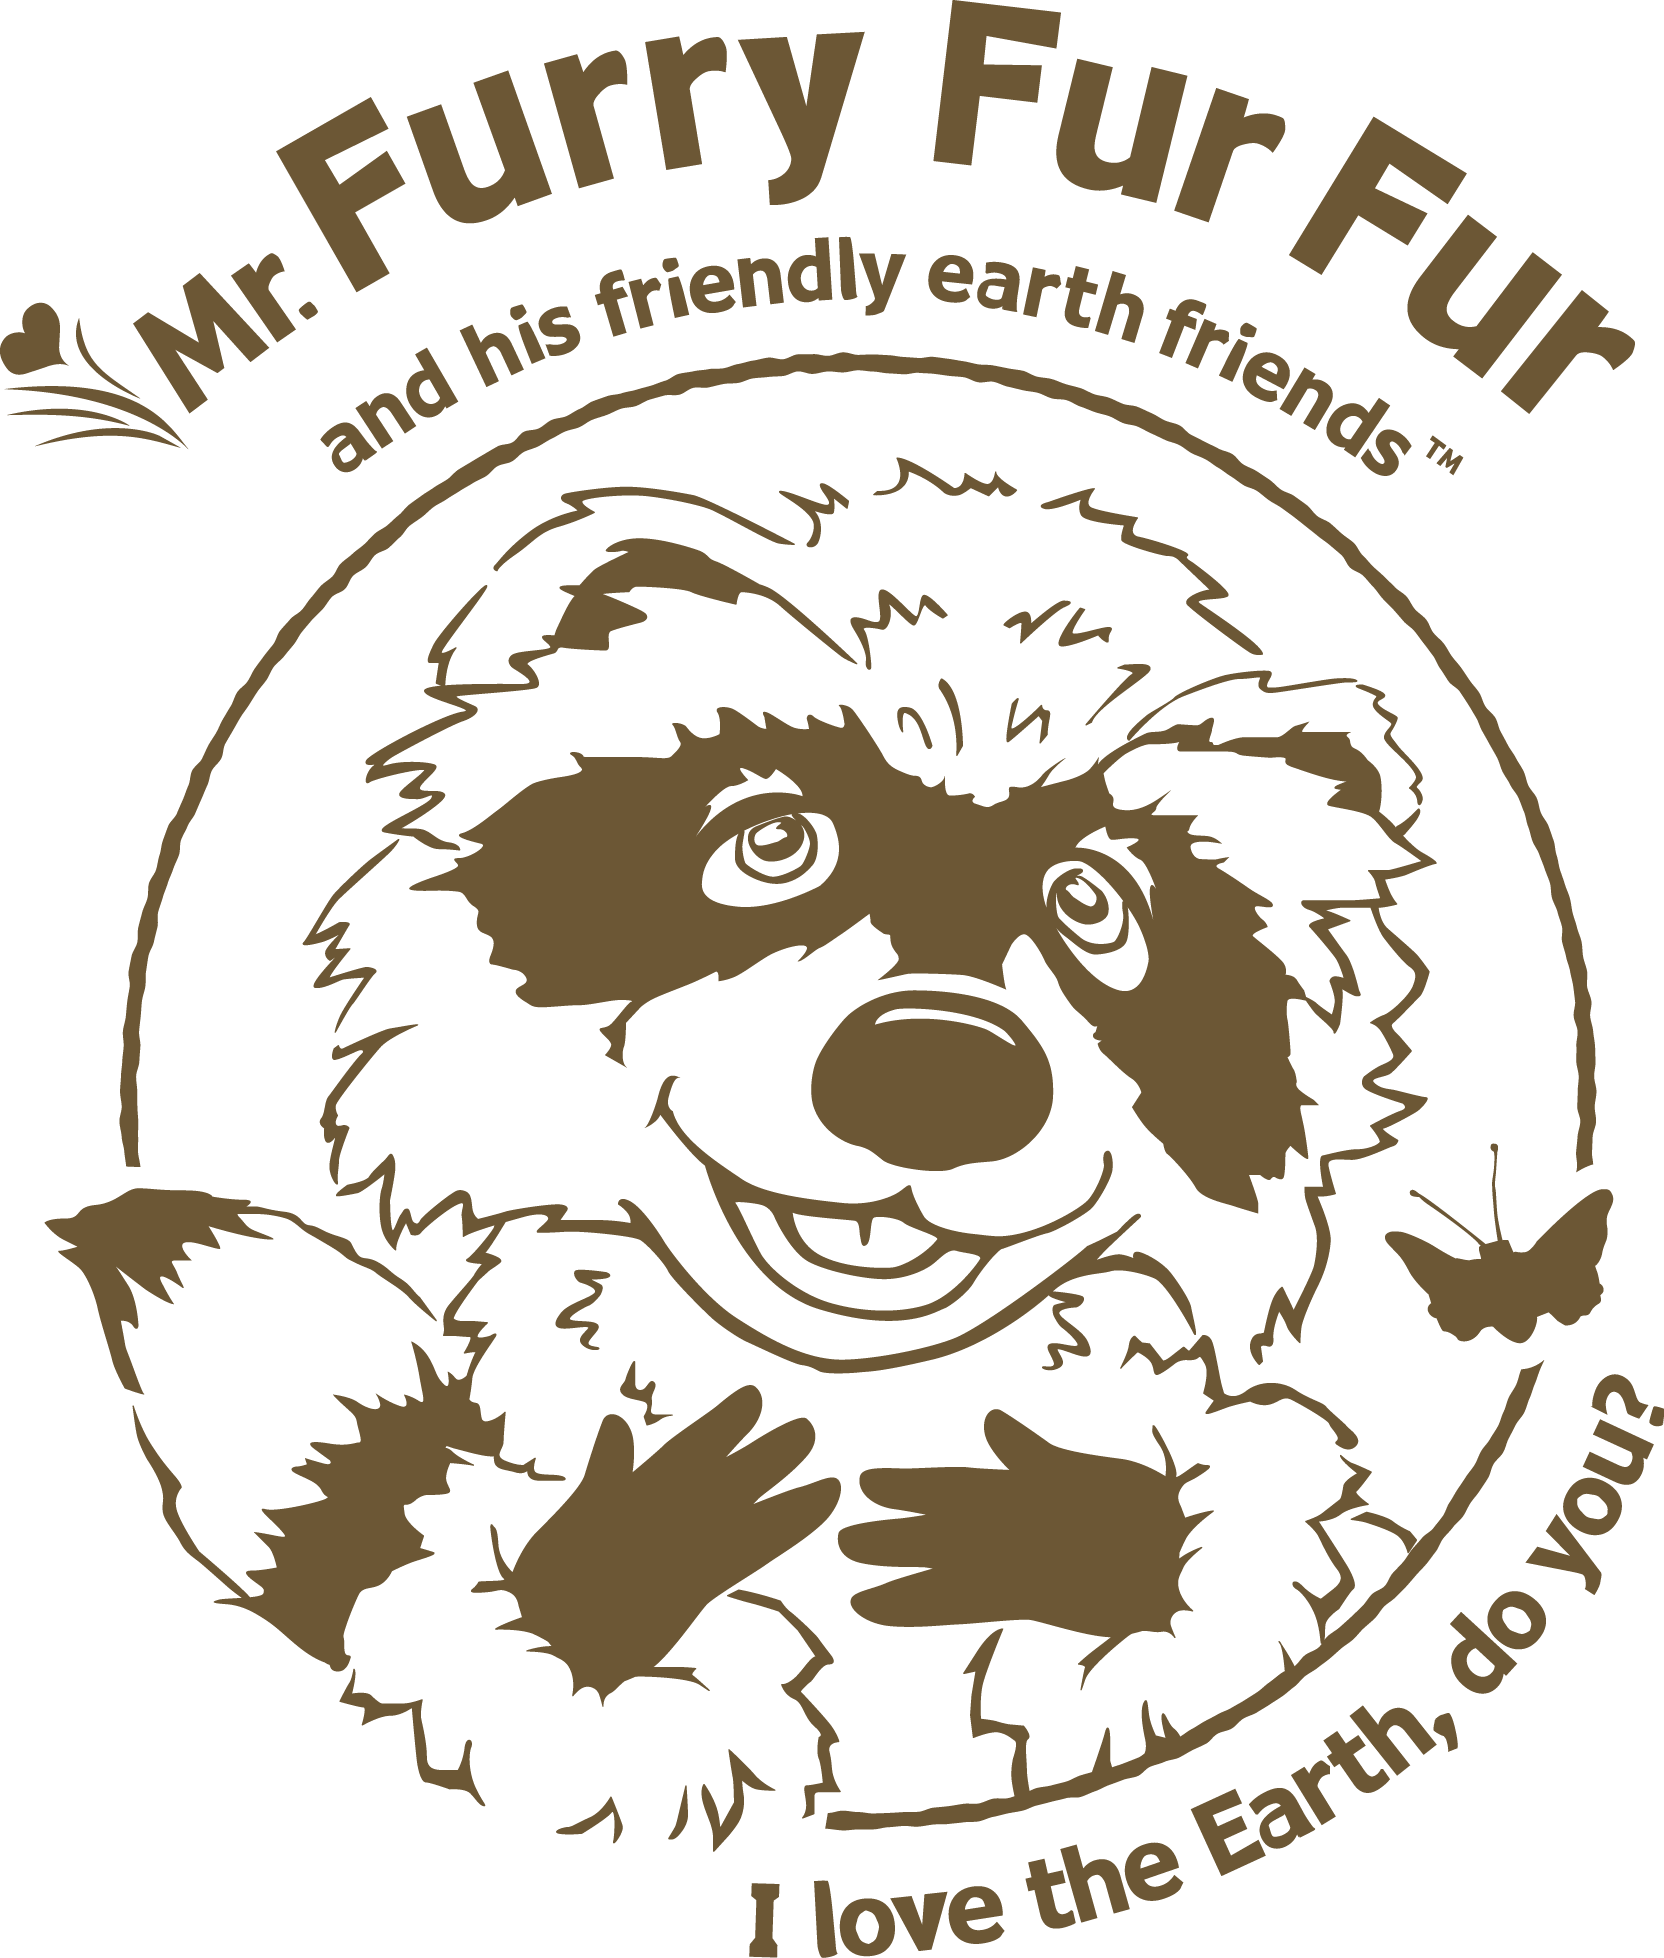 MrFTshirtArtFinal.png